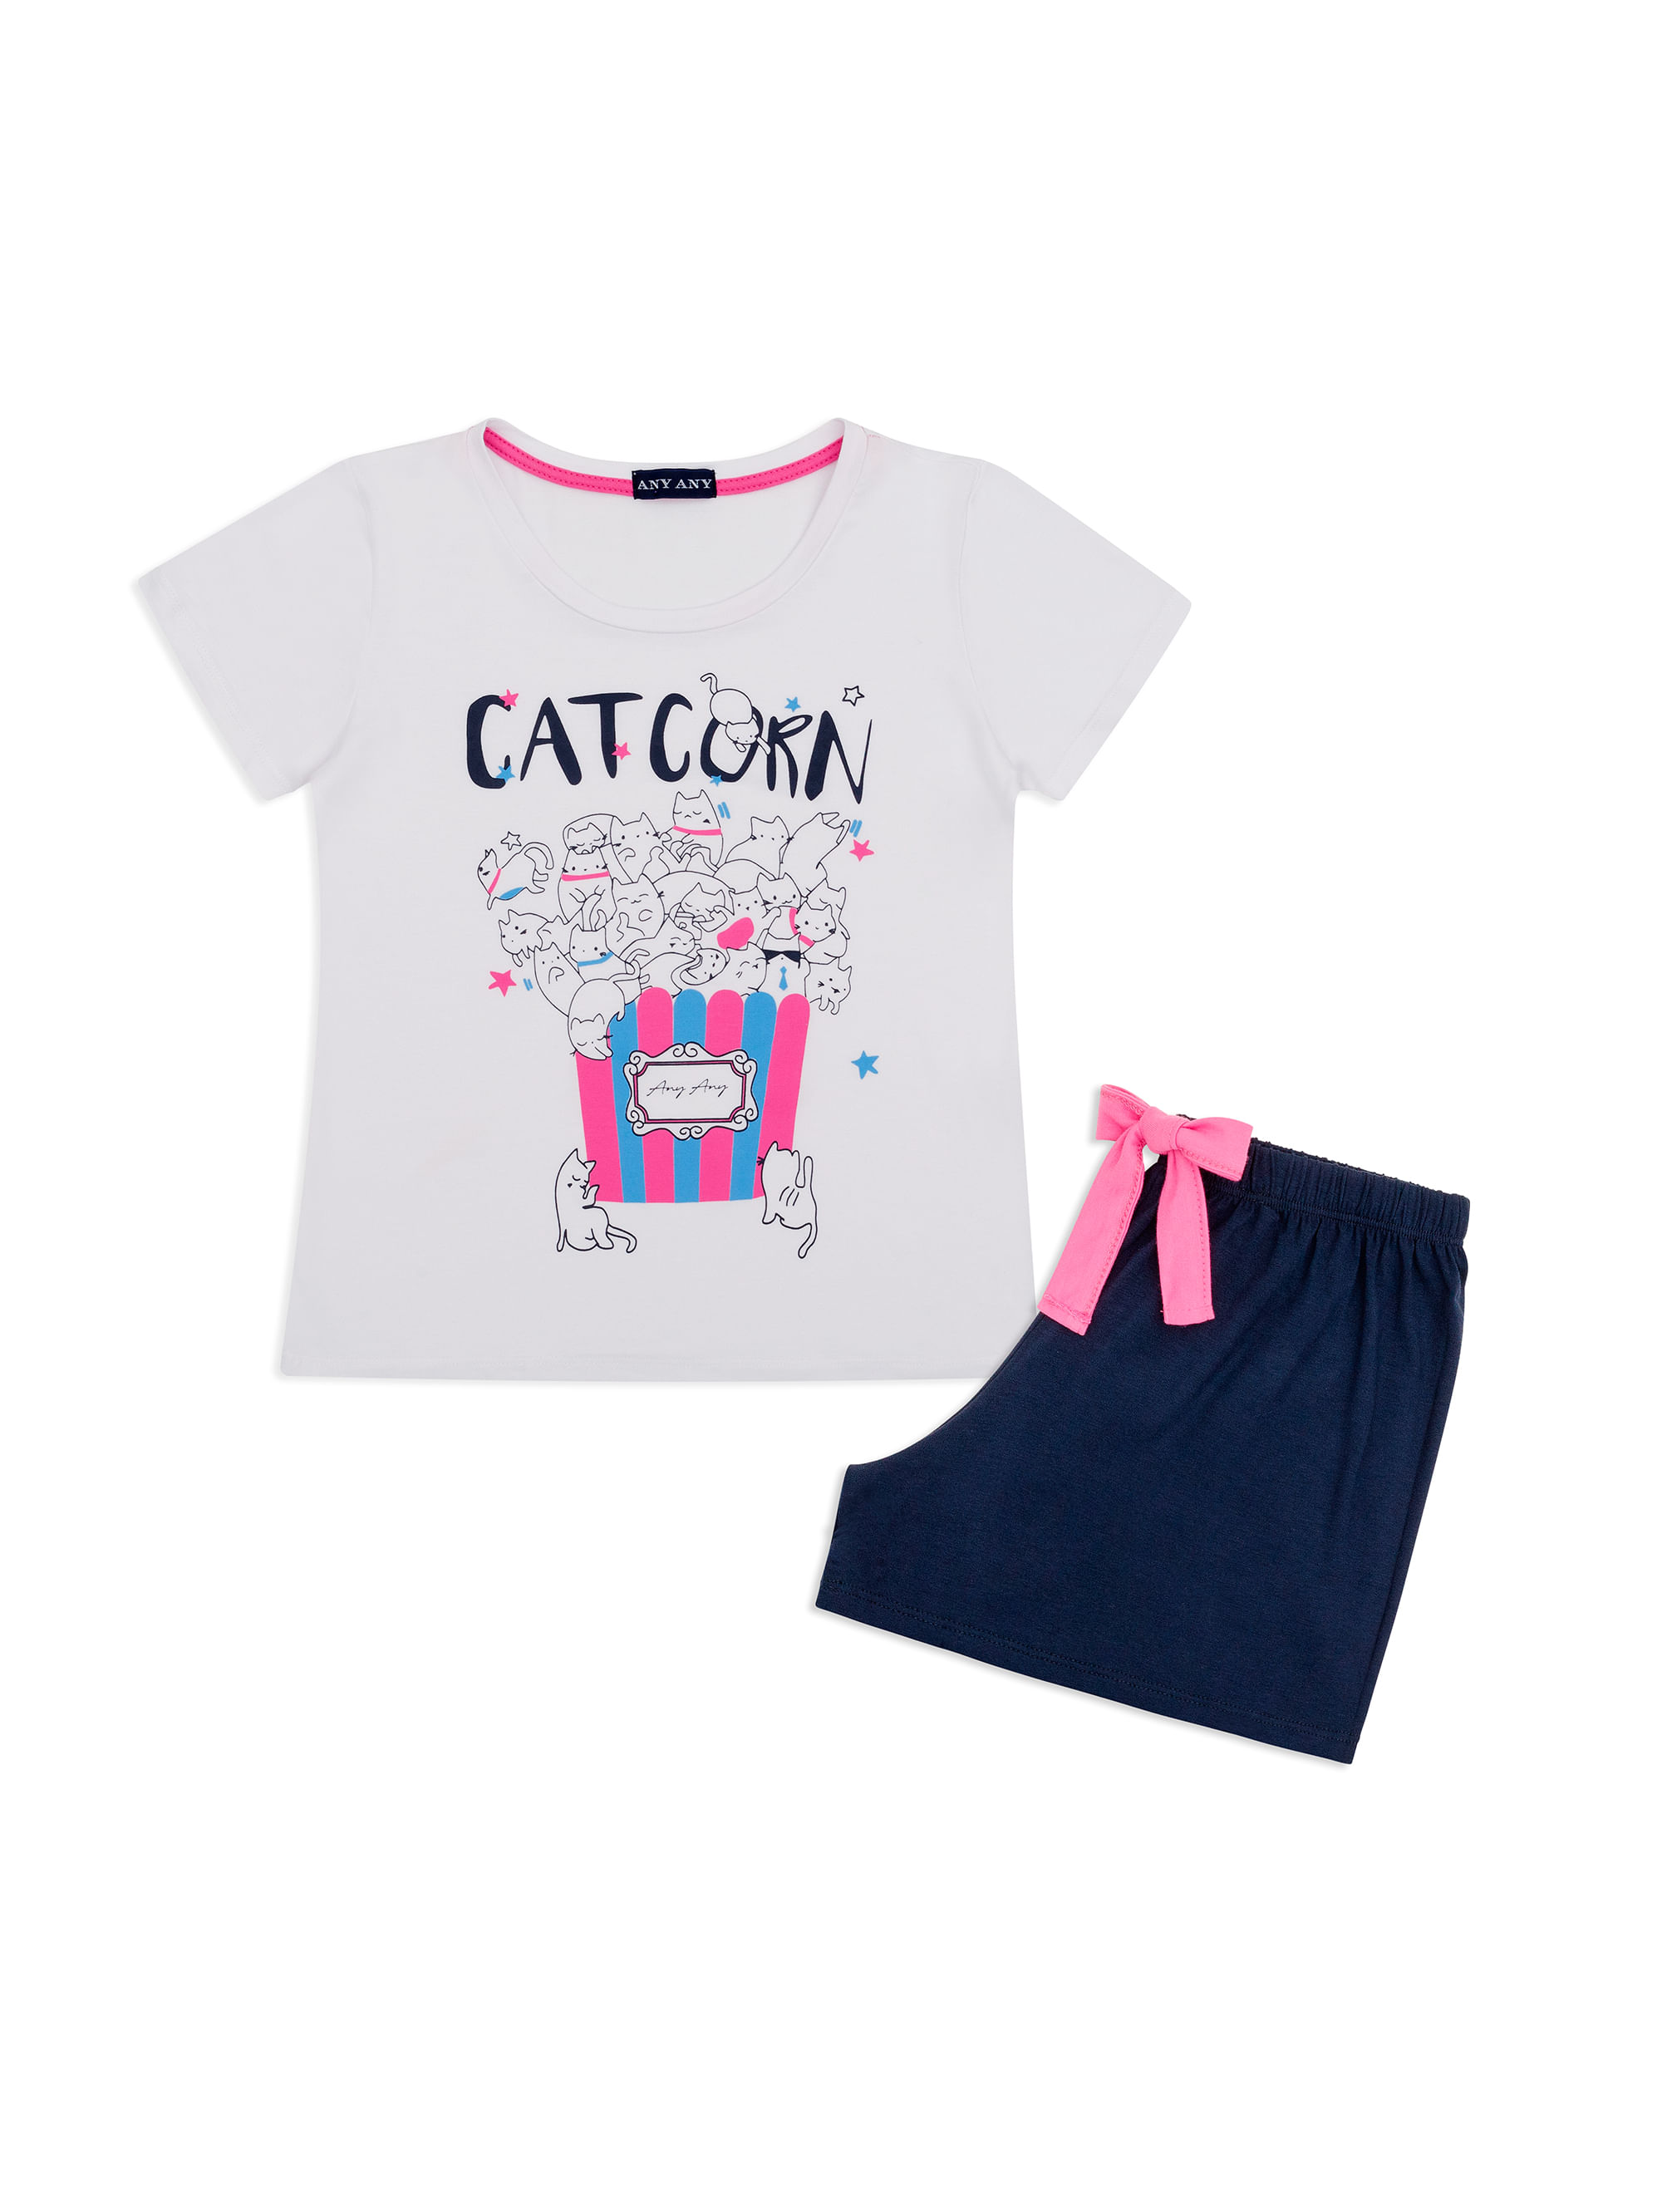 b7df7b078 anyany 2019 · Infantil · Menina. SD-MC-I-CAT-CORN-OUT-0603140505027. Short  Doll Infantil Manga Curta ...